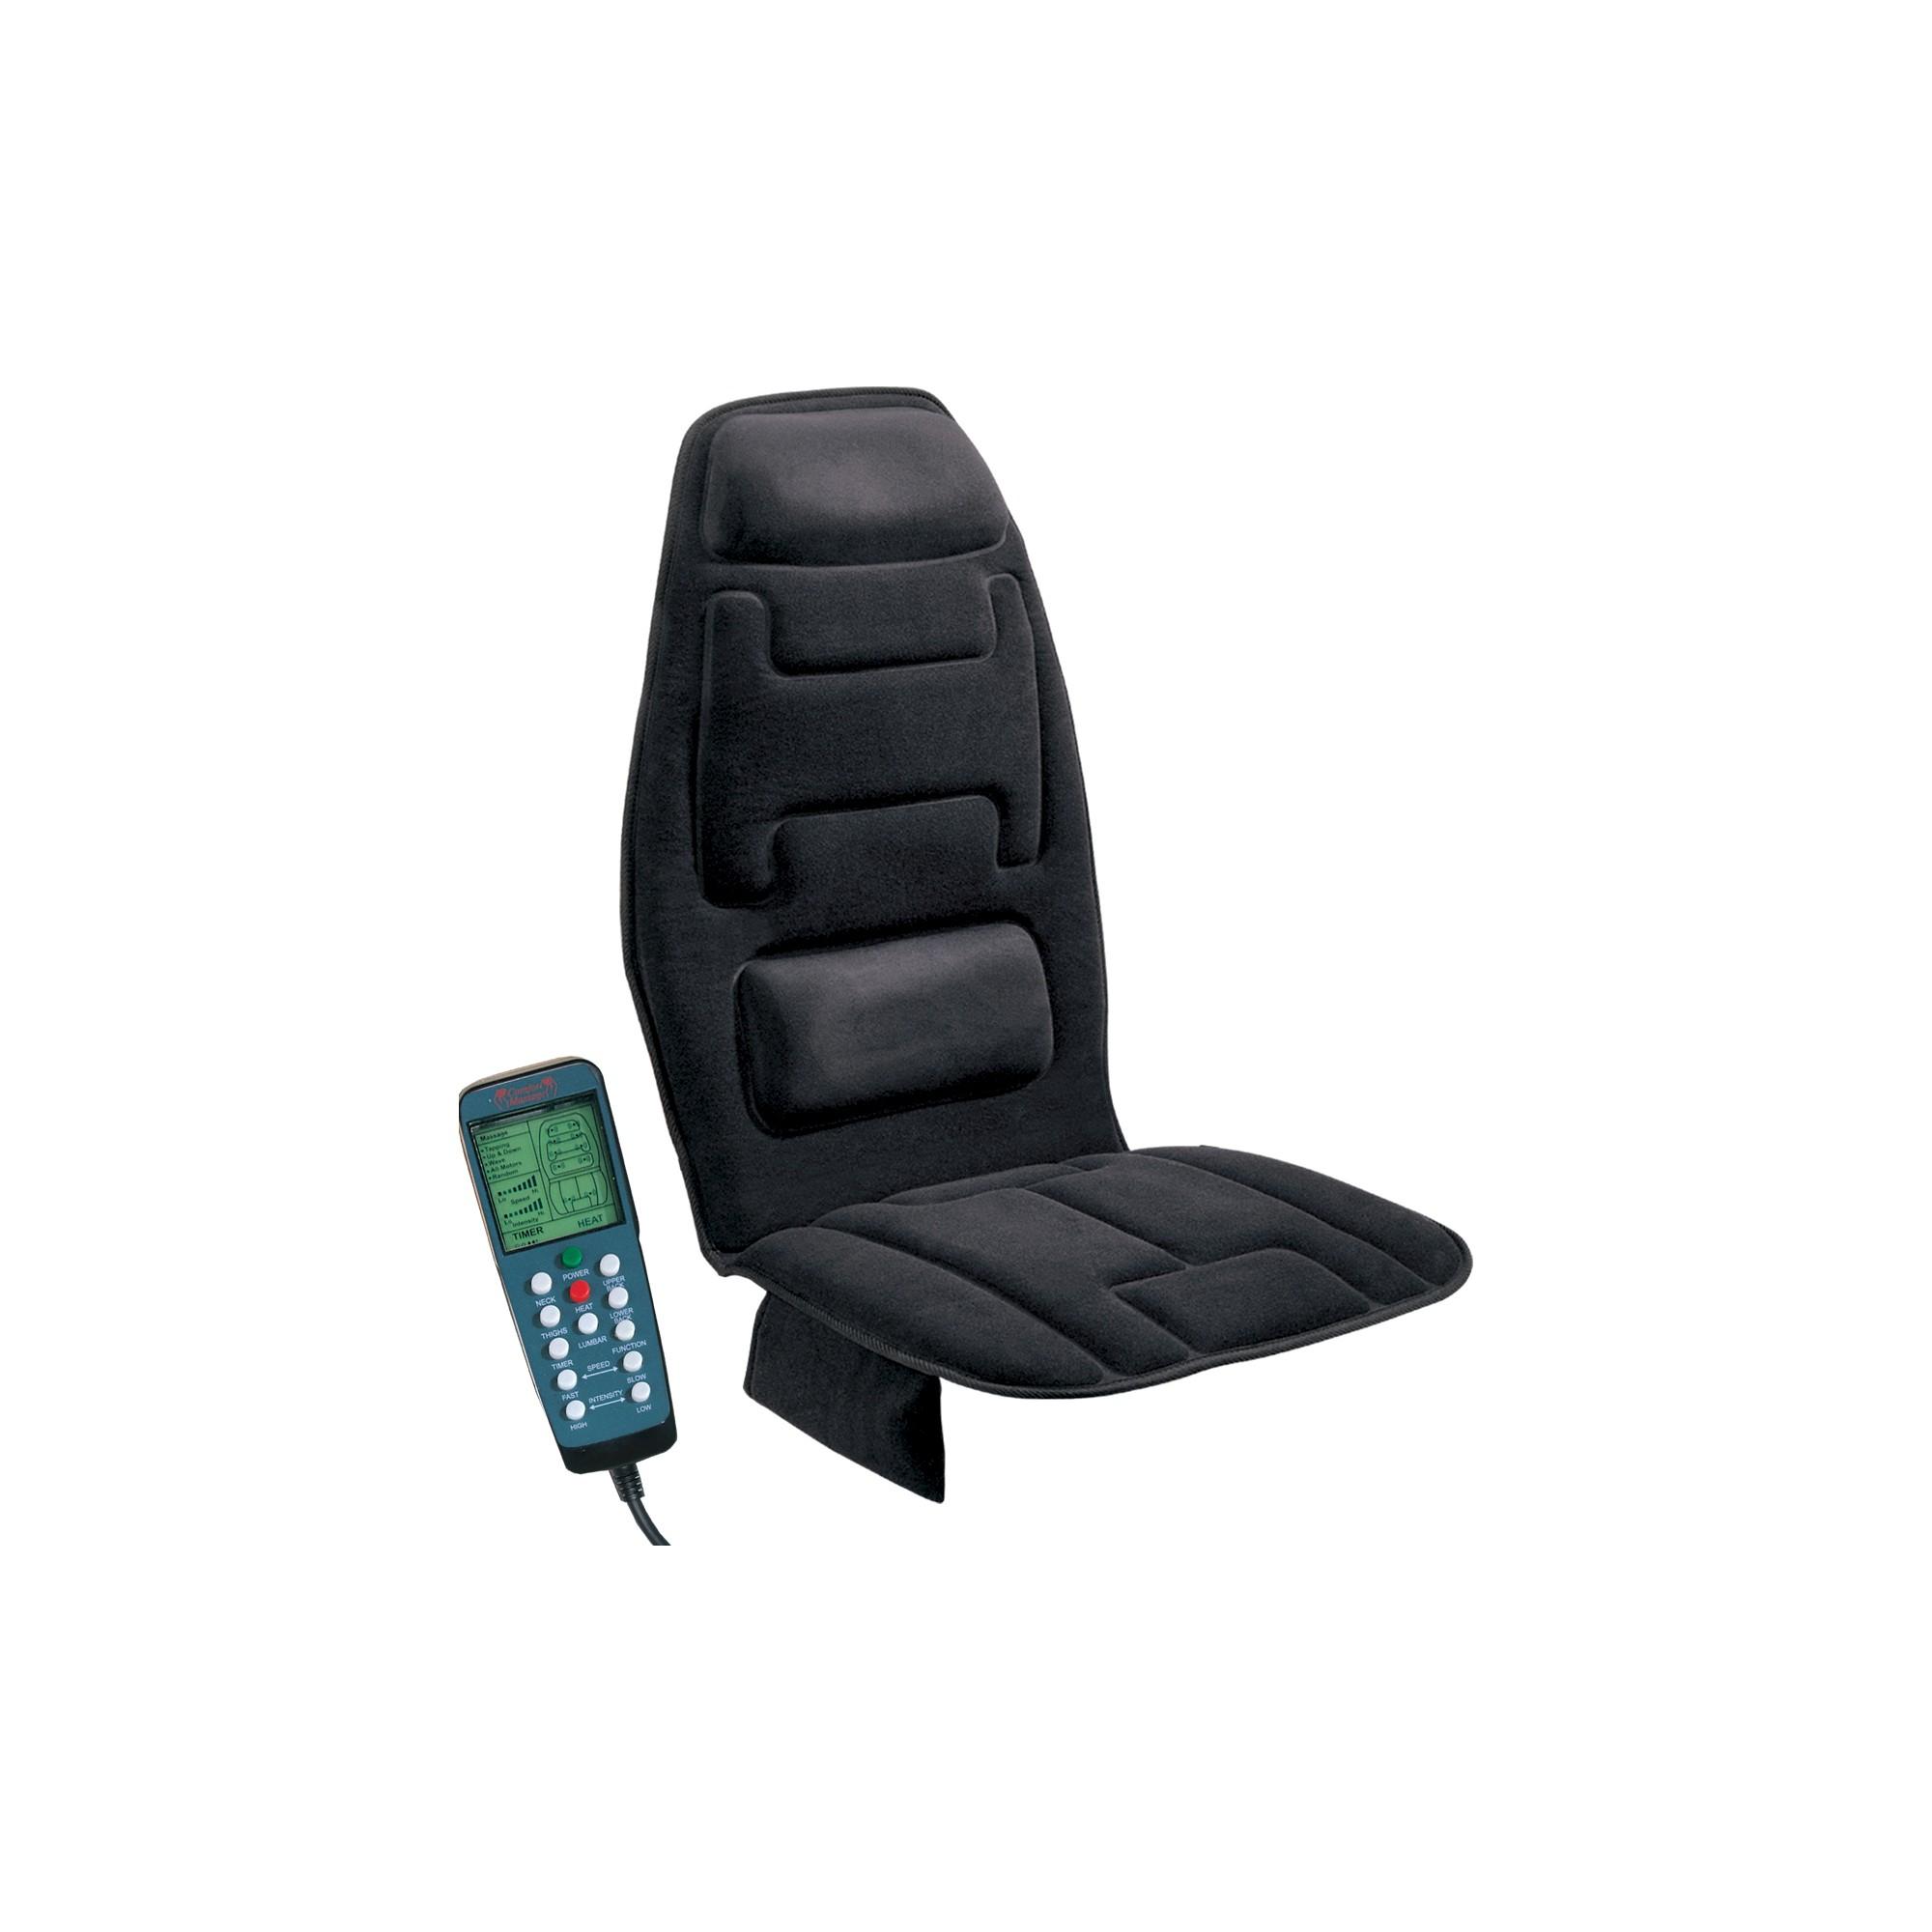 10-Motor Massaging Cushion with Heat, Black